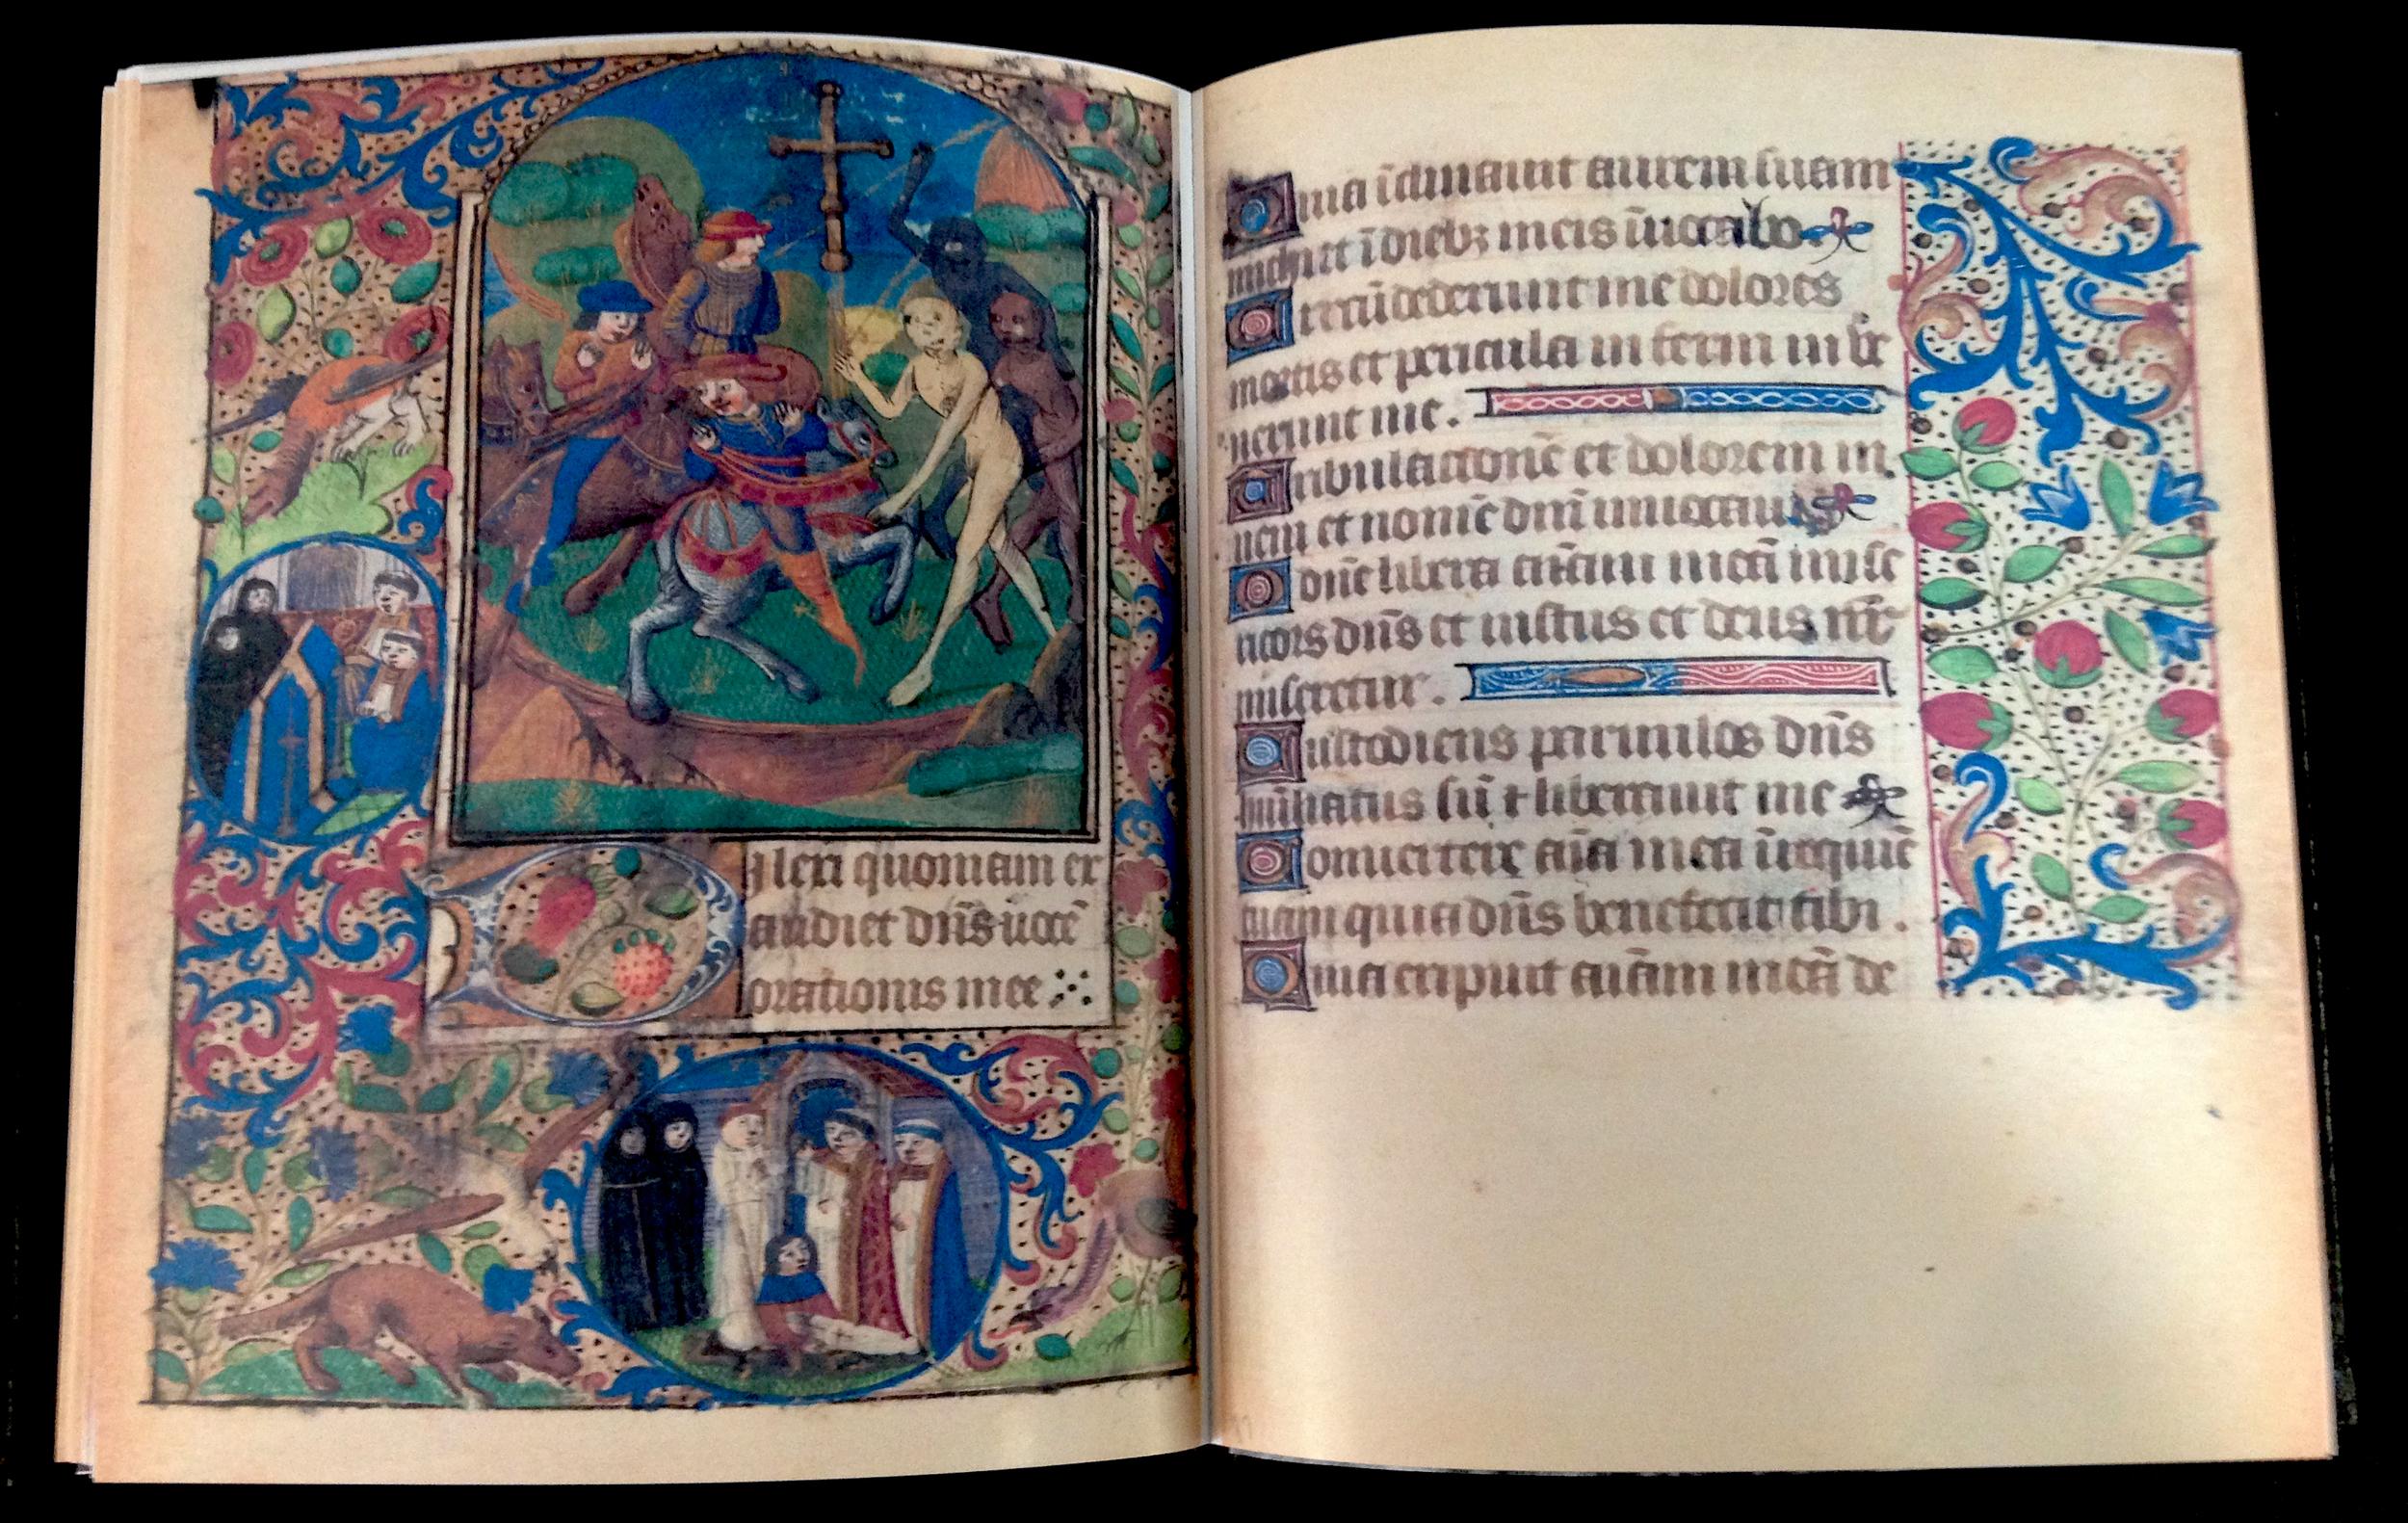 CATHOLIC CHURCH Facsimile BOOK OF HOURS USE OF ORLÉANS 1490